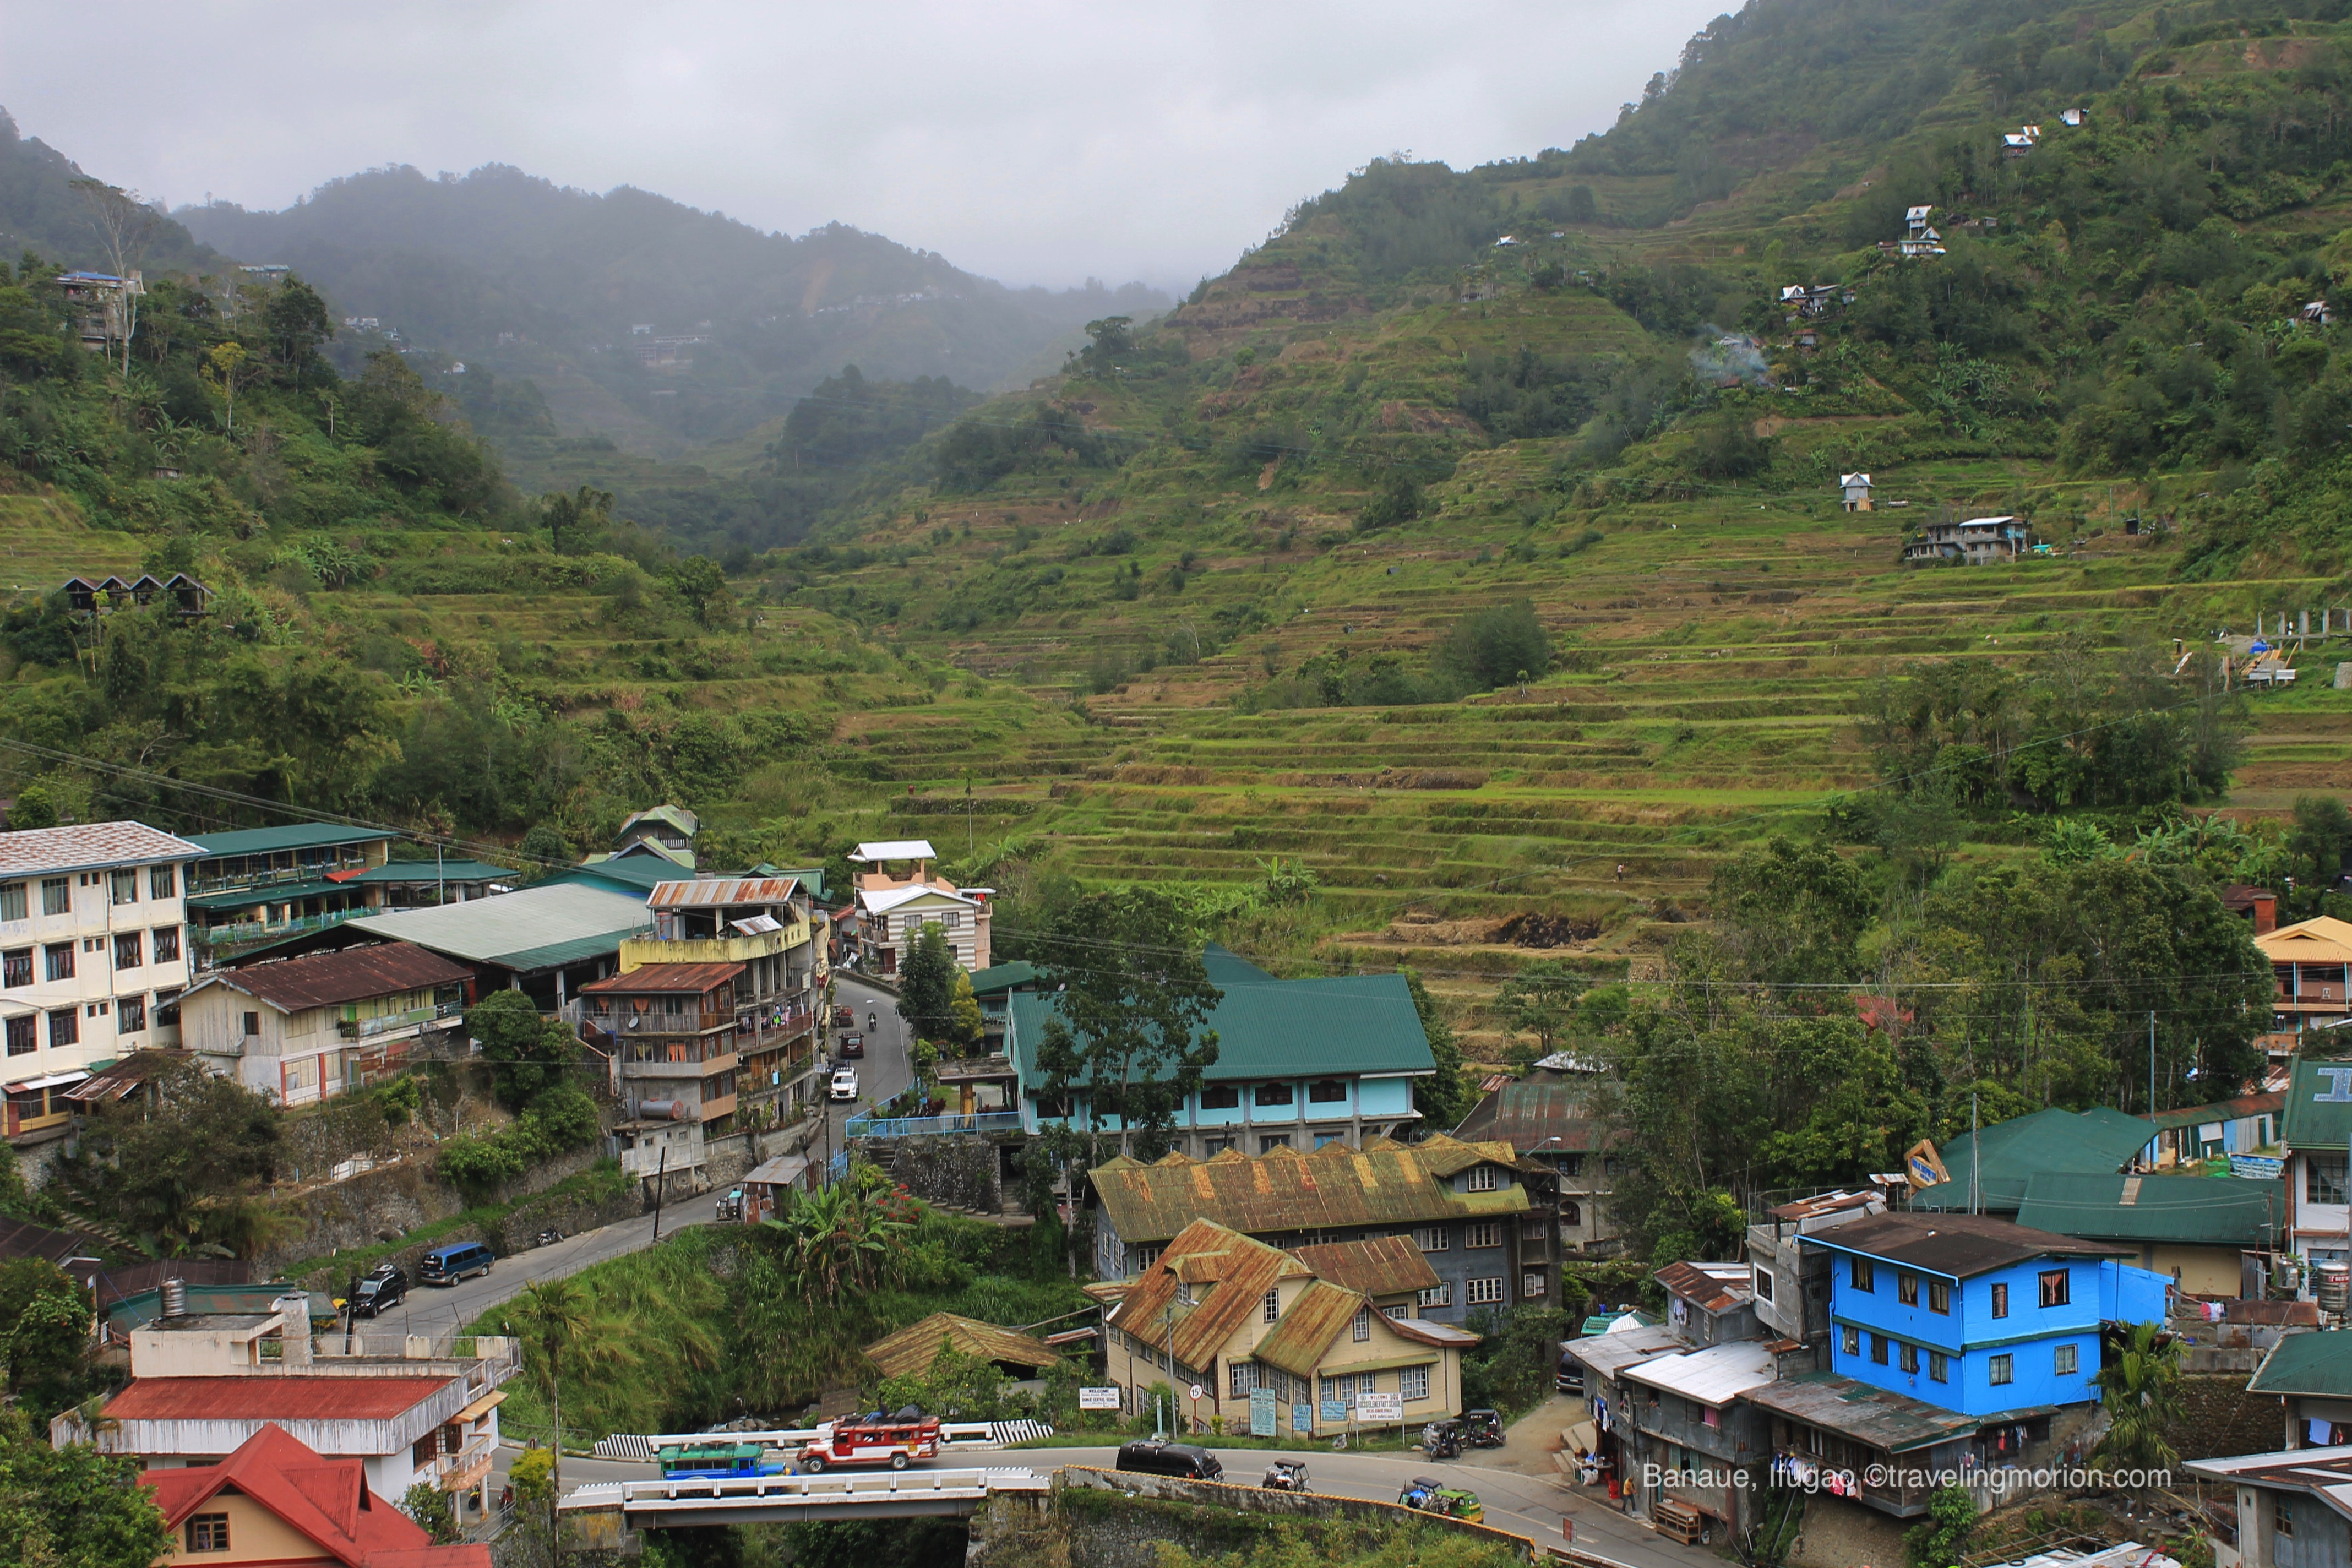 Town Proper Banaue